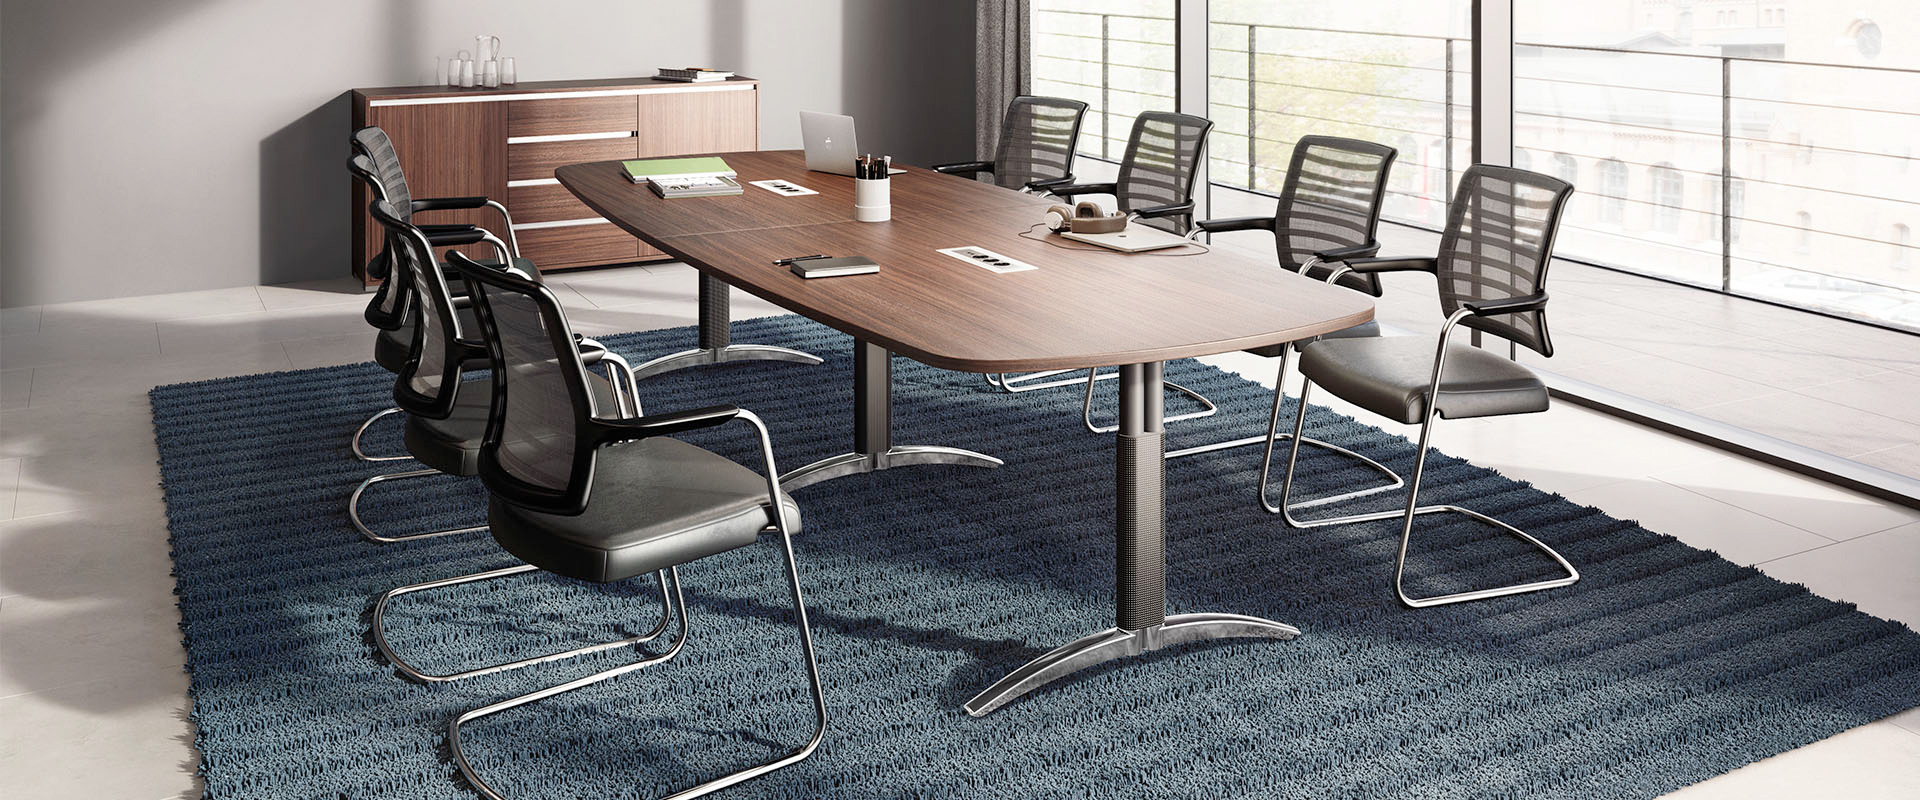 Satec Büromöbel | Wir richten Büros ein